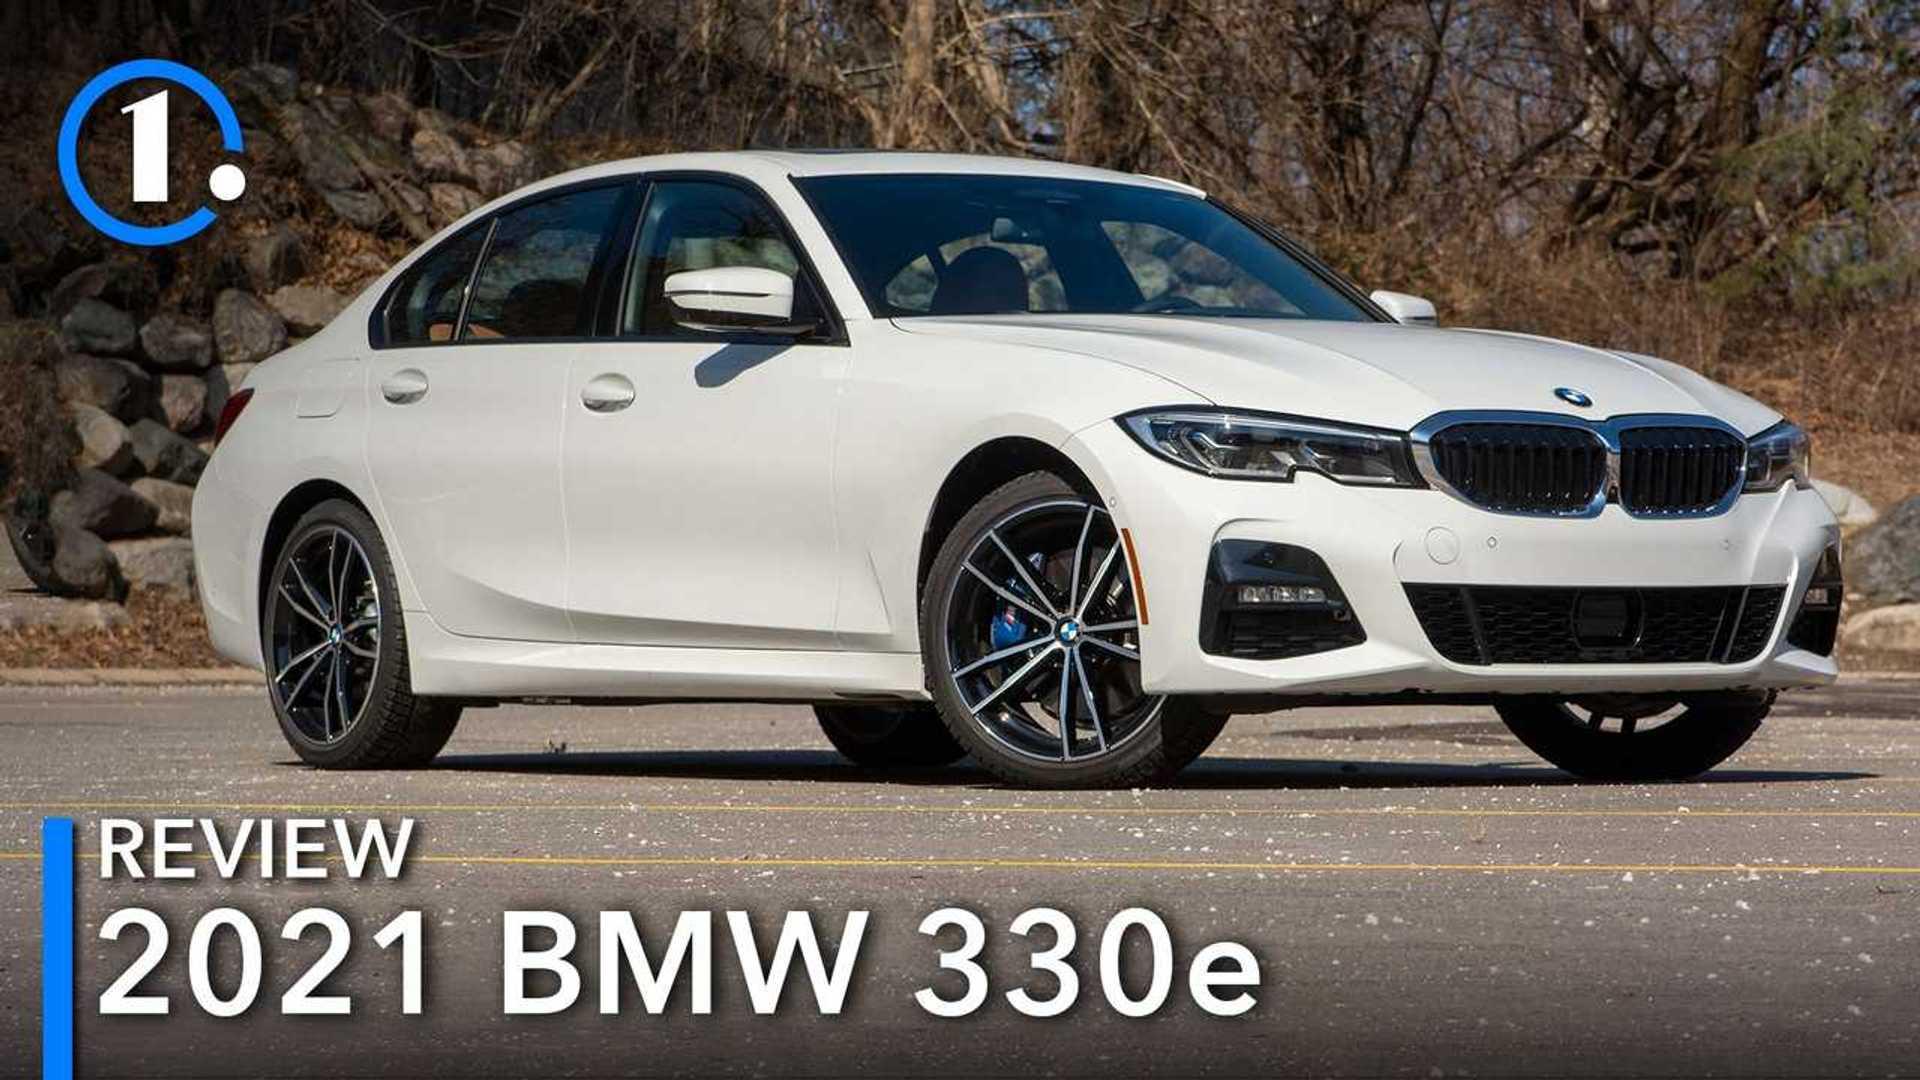 12 BMW 12e Review Peak Refinement